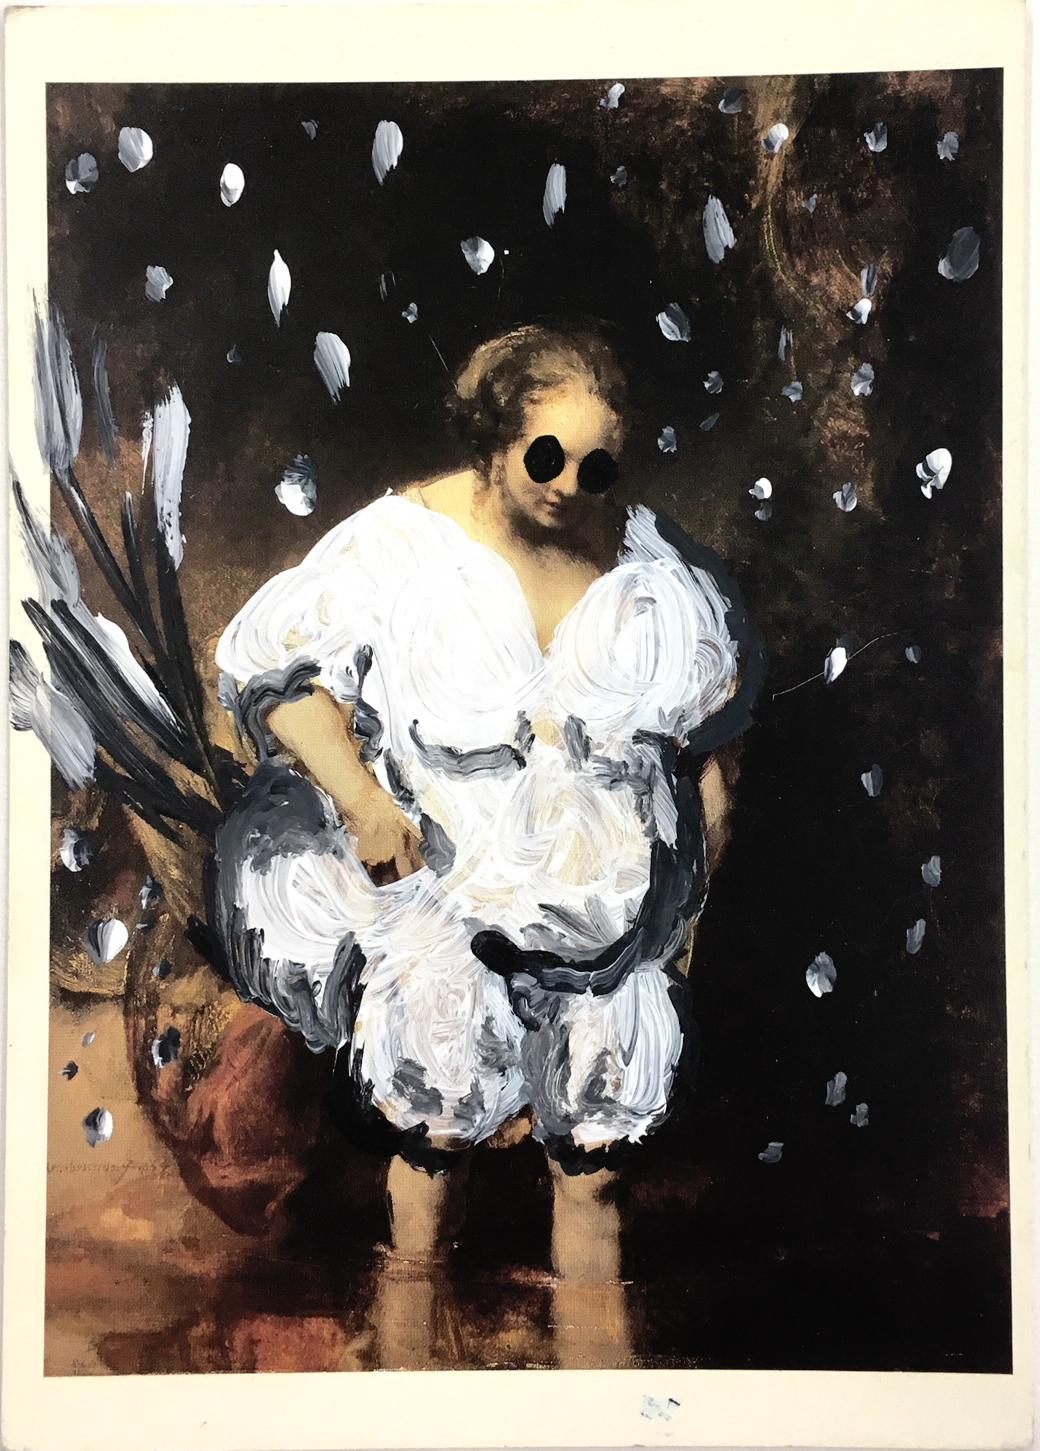 © Xavier Noiret-Thomé, Painting on postcard, 2019